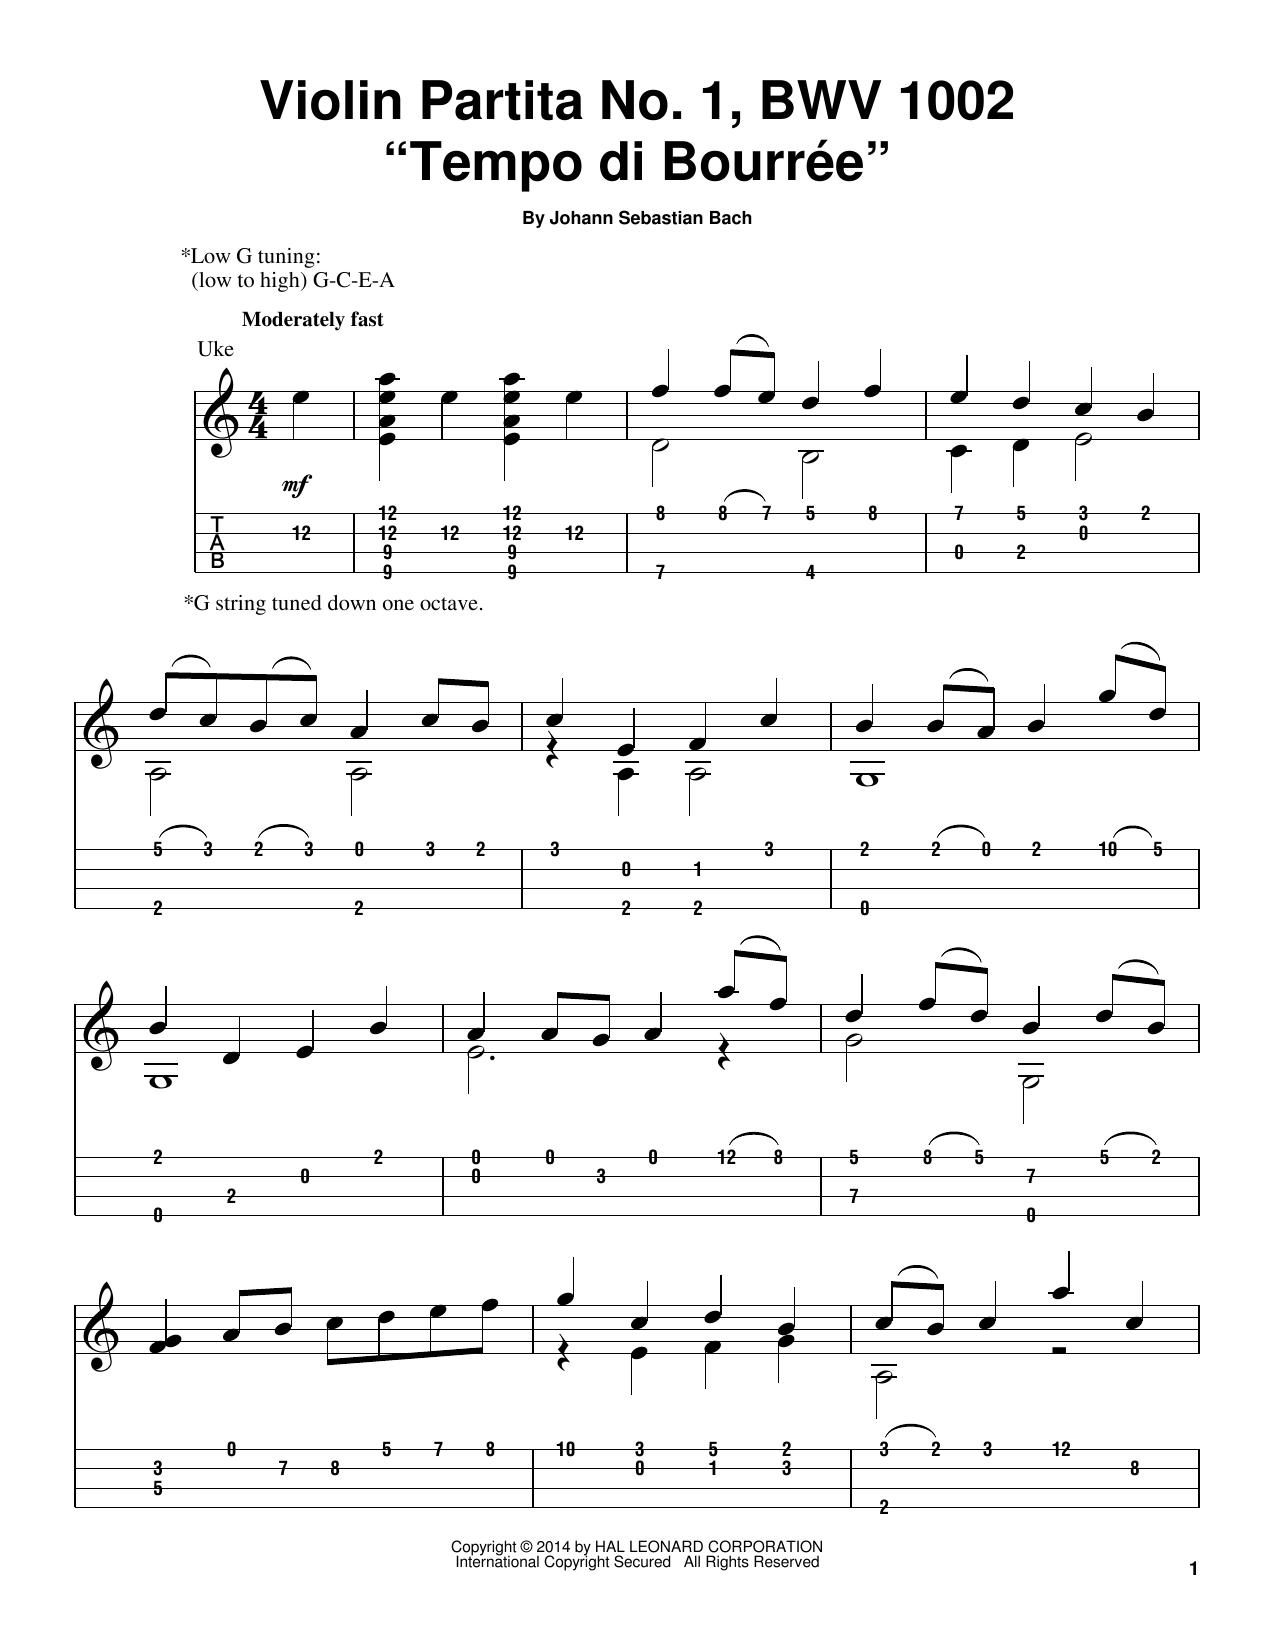 Tempo Di Bourree, BWV 1002 (Ukulele)